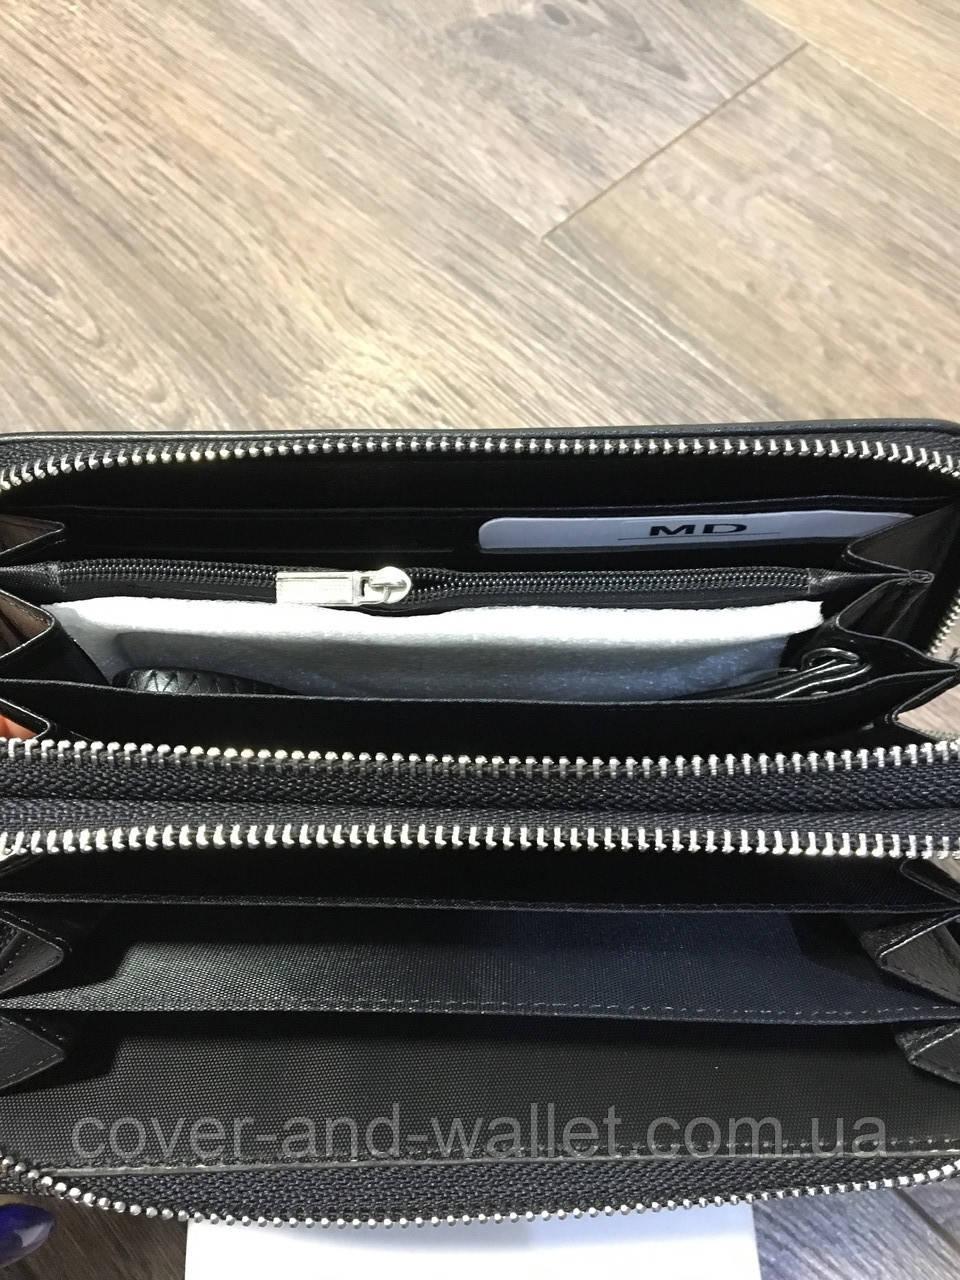 f5f8491882b1 Мужской клатч на две молнии MD COLLECTION черный: продажа, цена в ...